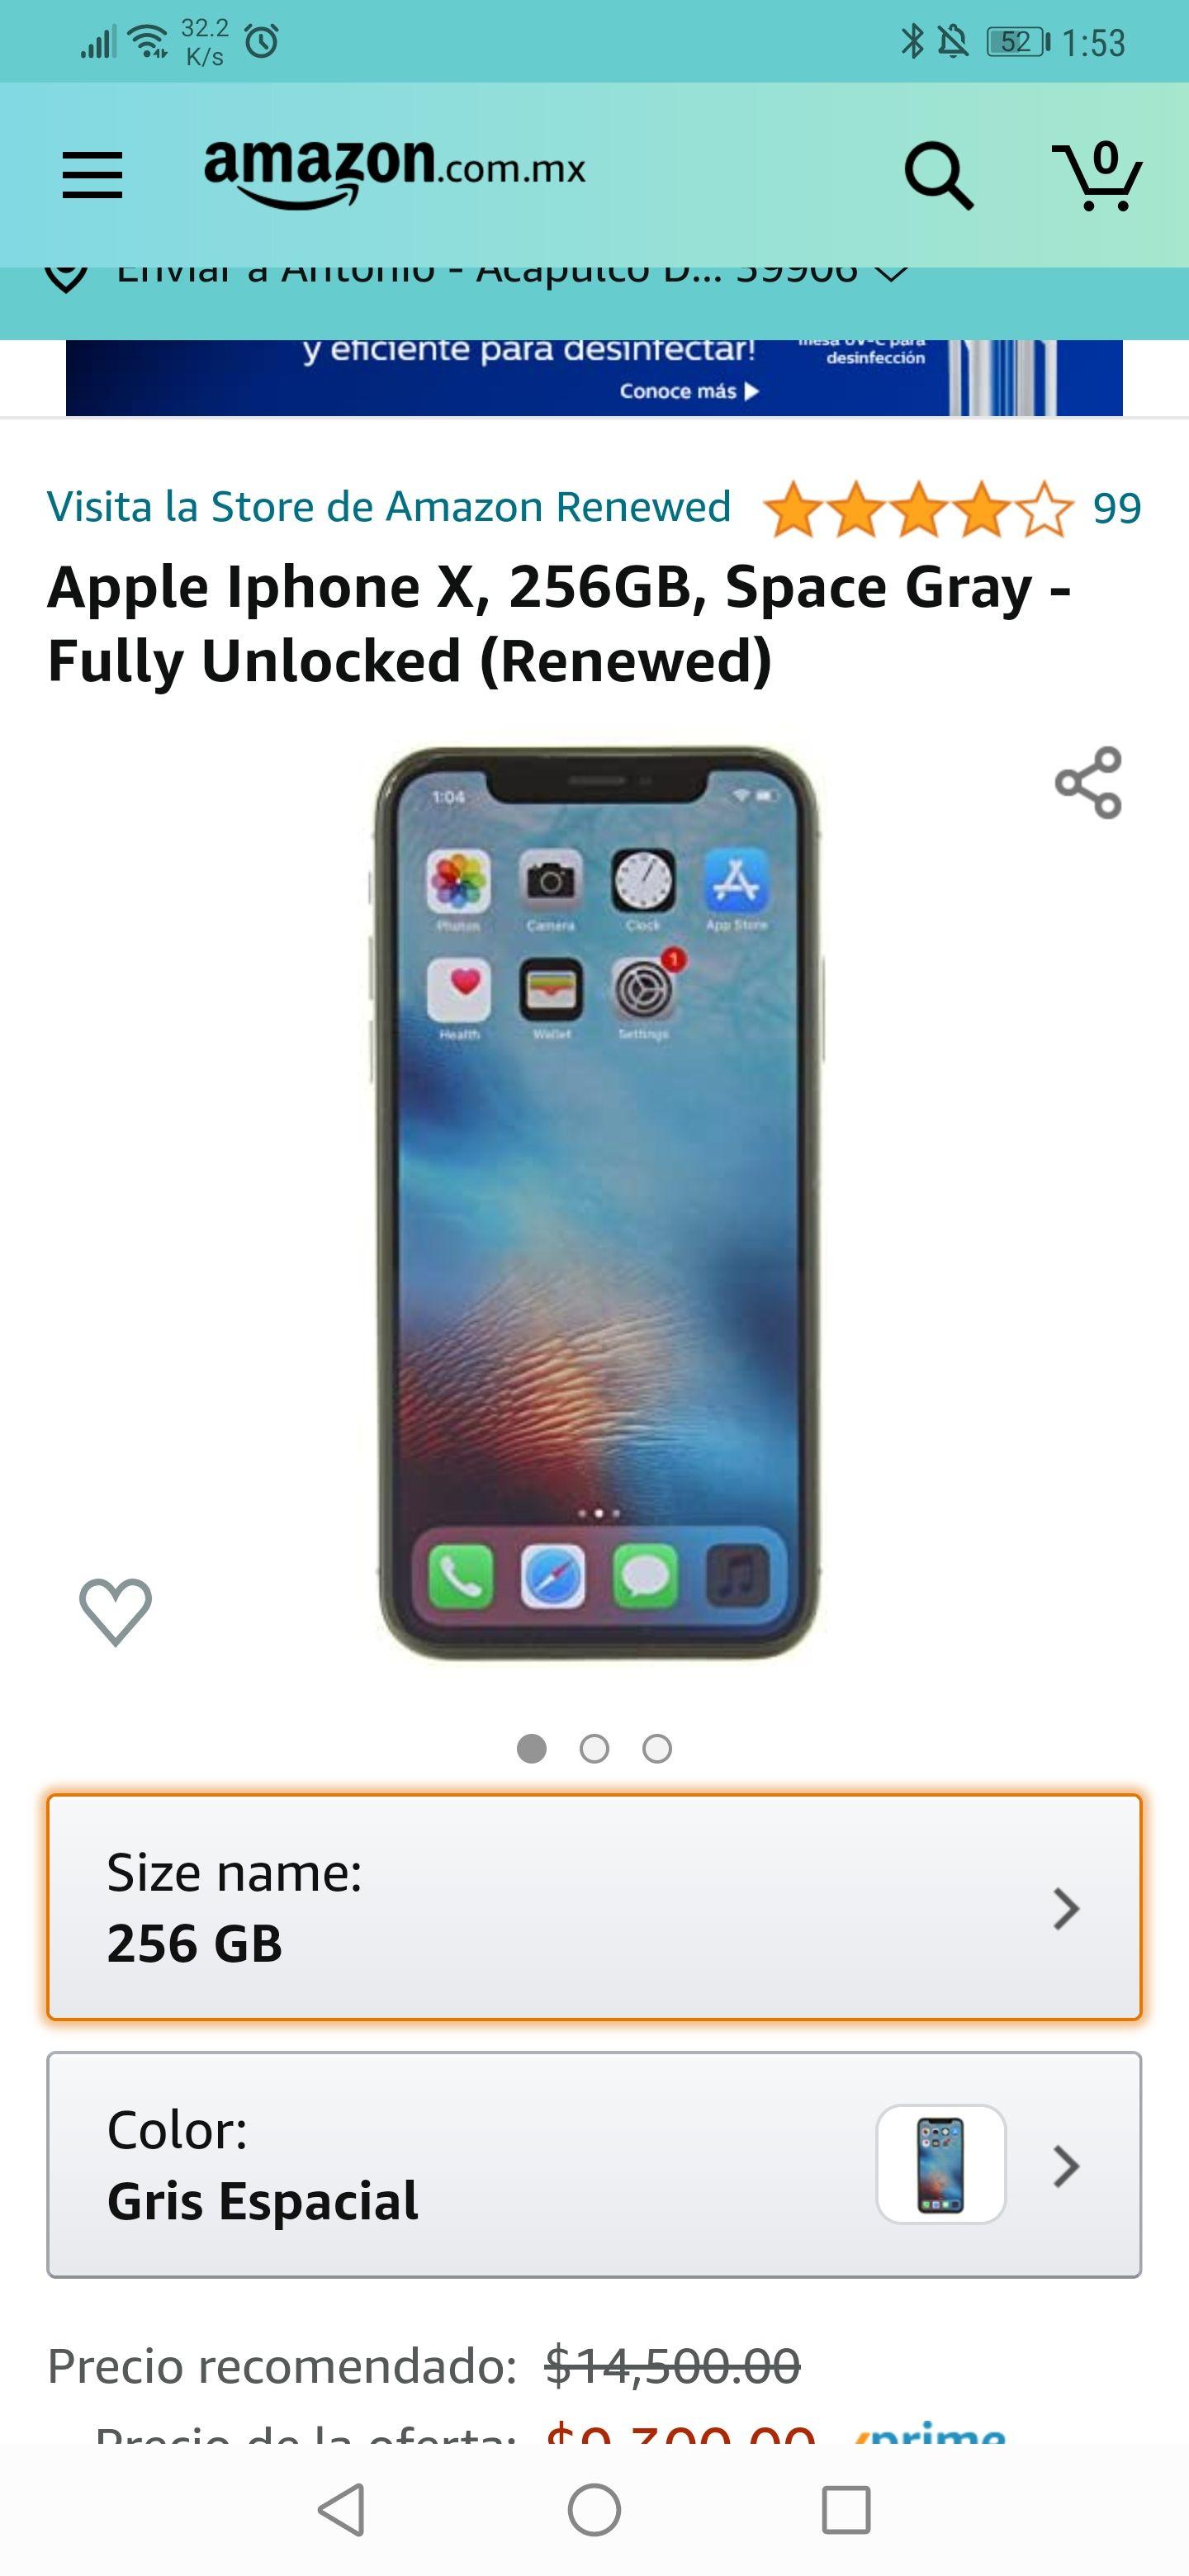 Amazon: iPhone X 256GB, Space Gray - Fully Unlocked (Renewed) ( keepa)